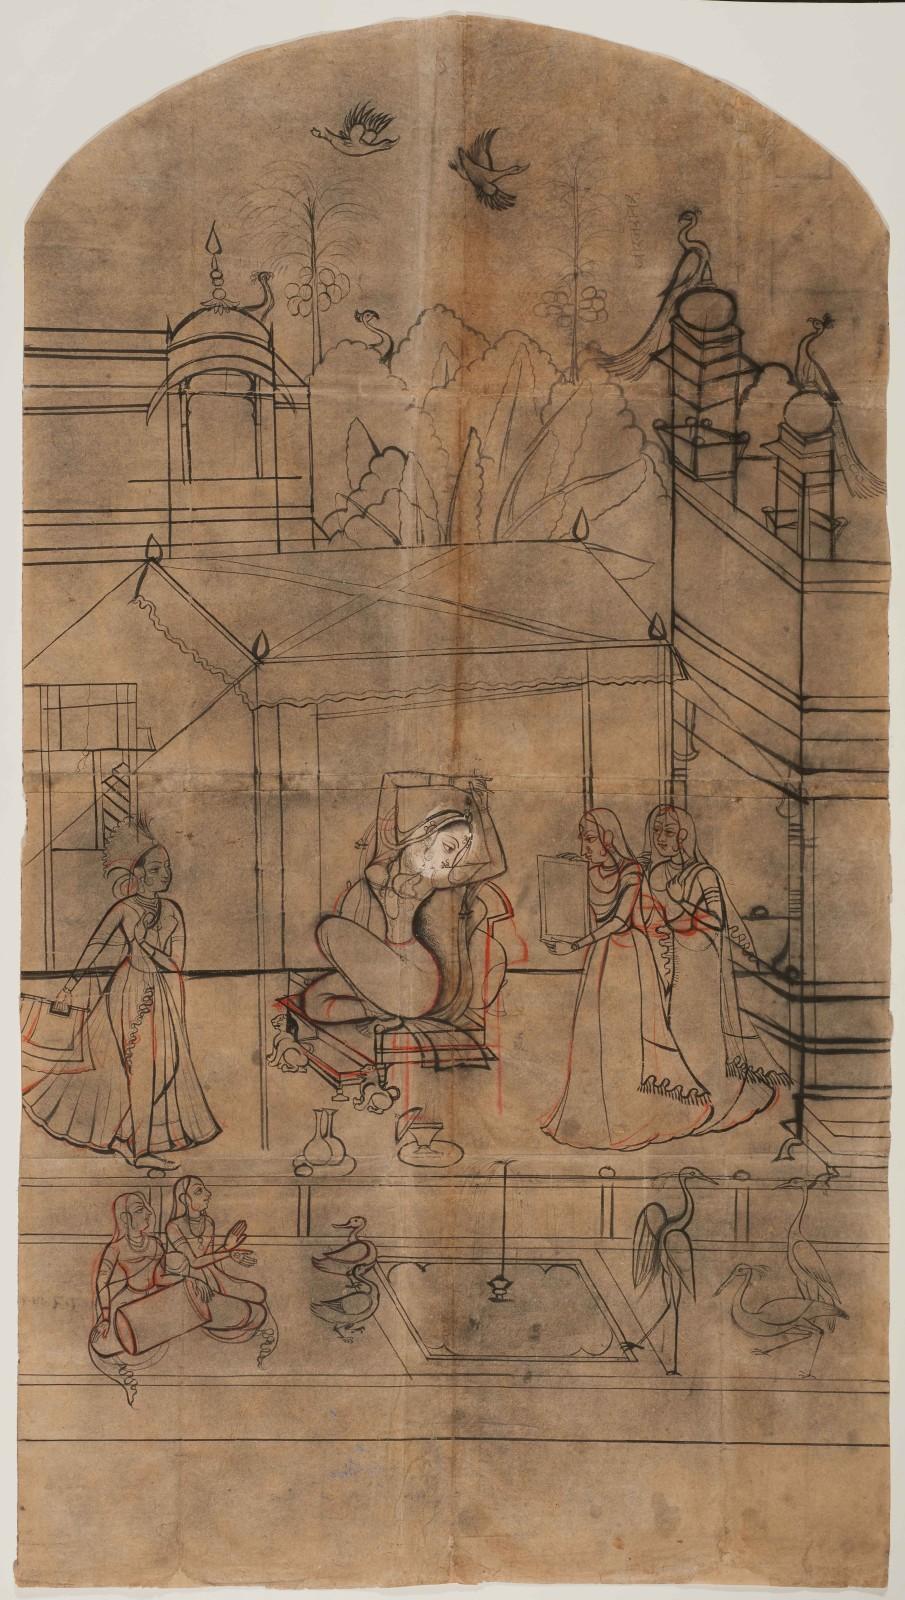 A large preparatory drawing for a wall painting depicting Deshvarati ragini, Rajasthan, Bundi, c. 1770-80